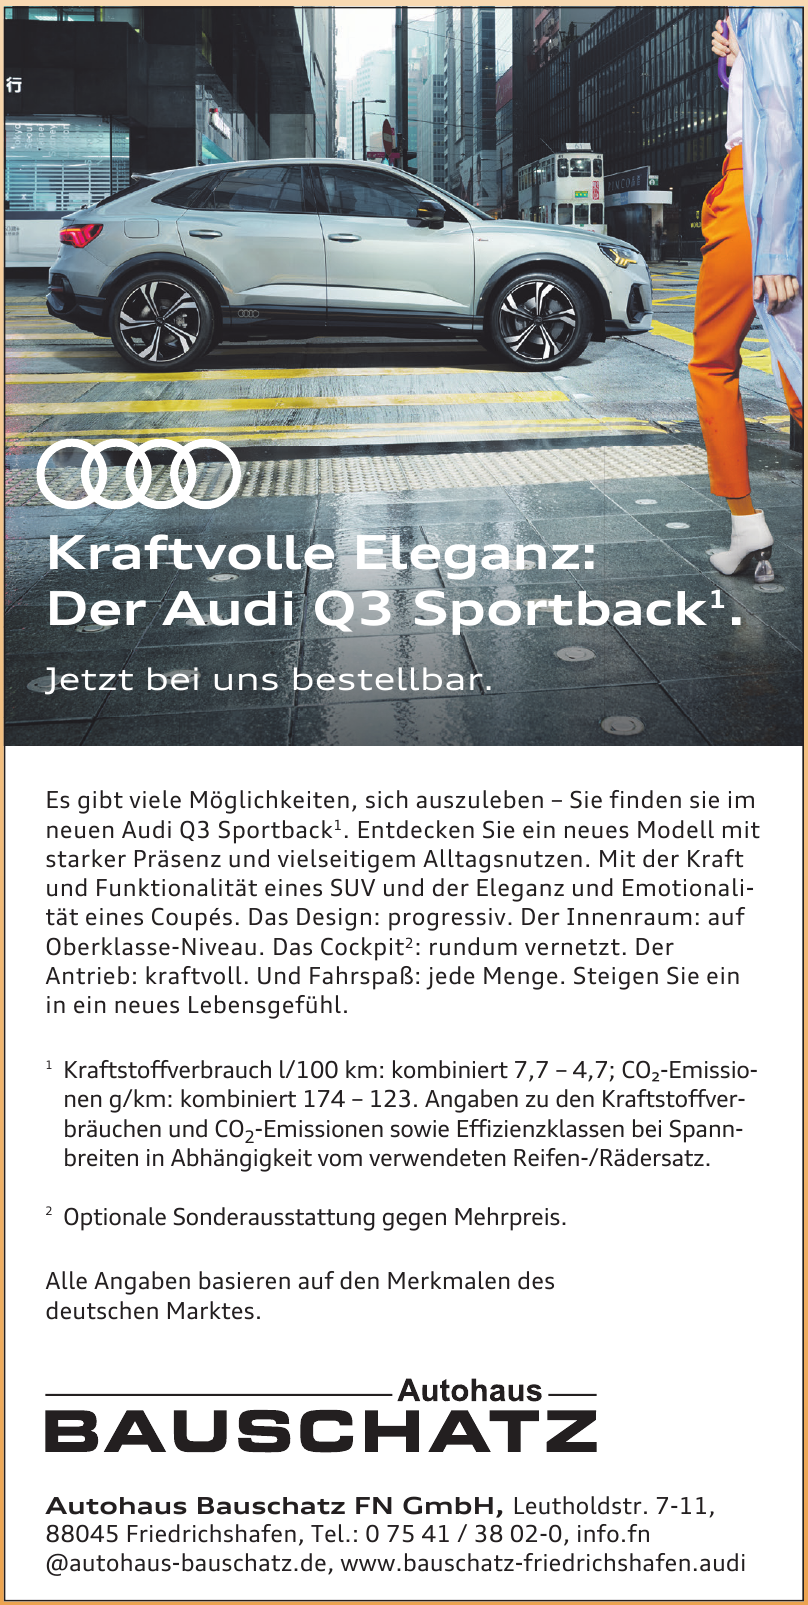 Autohaus Bauschatz GmbH